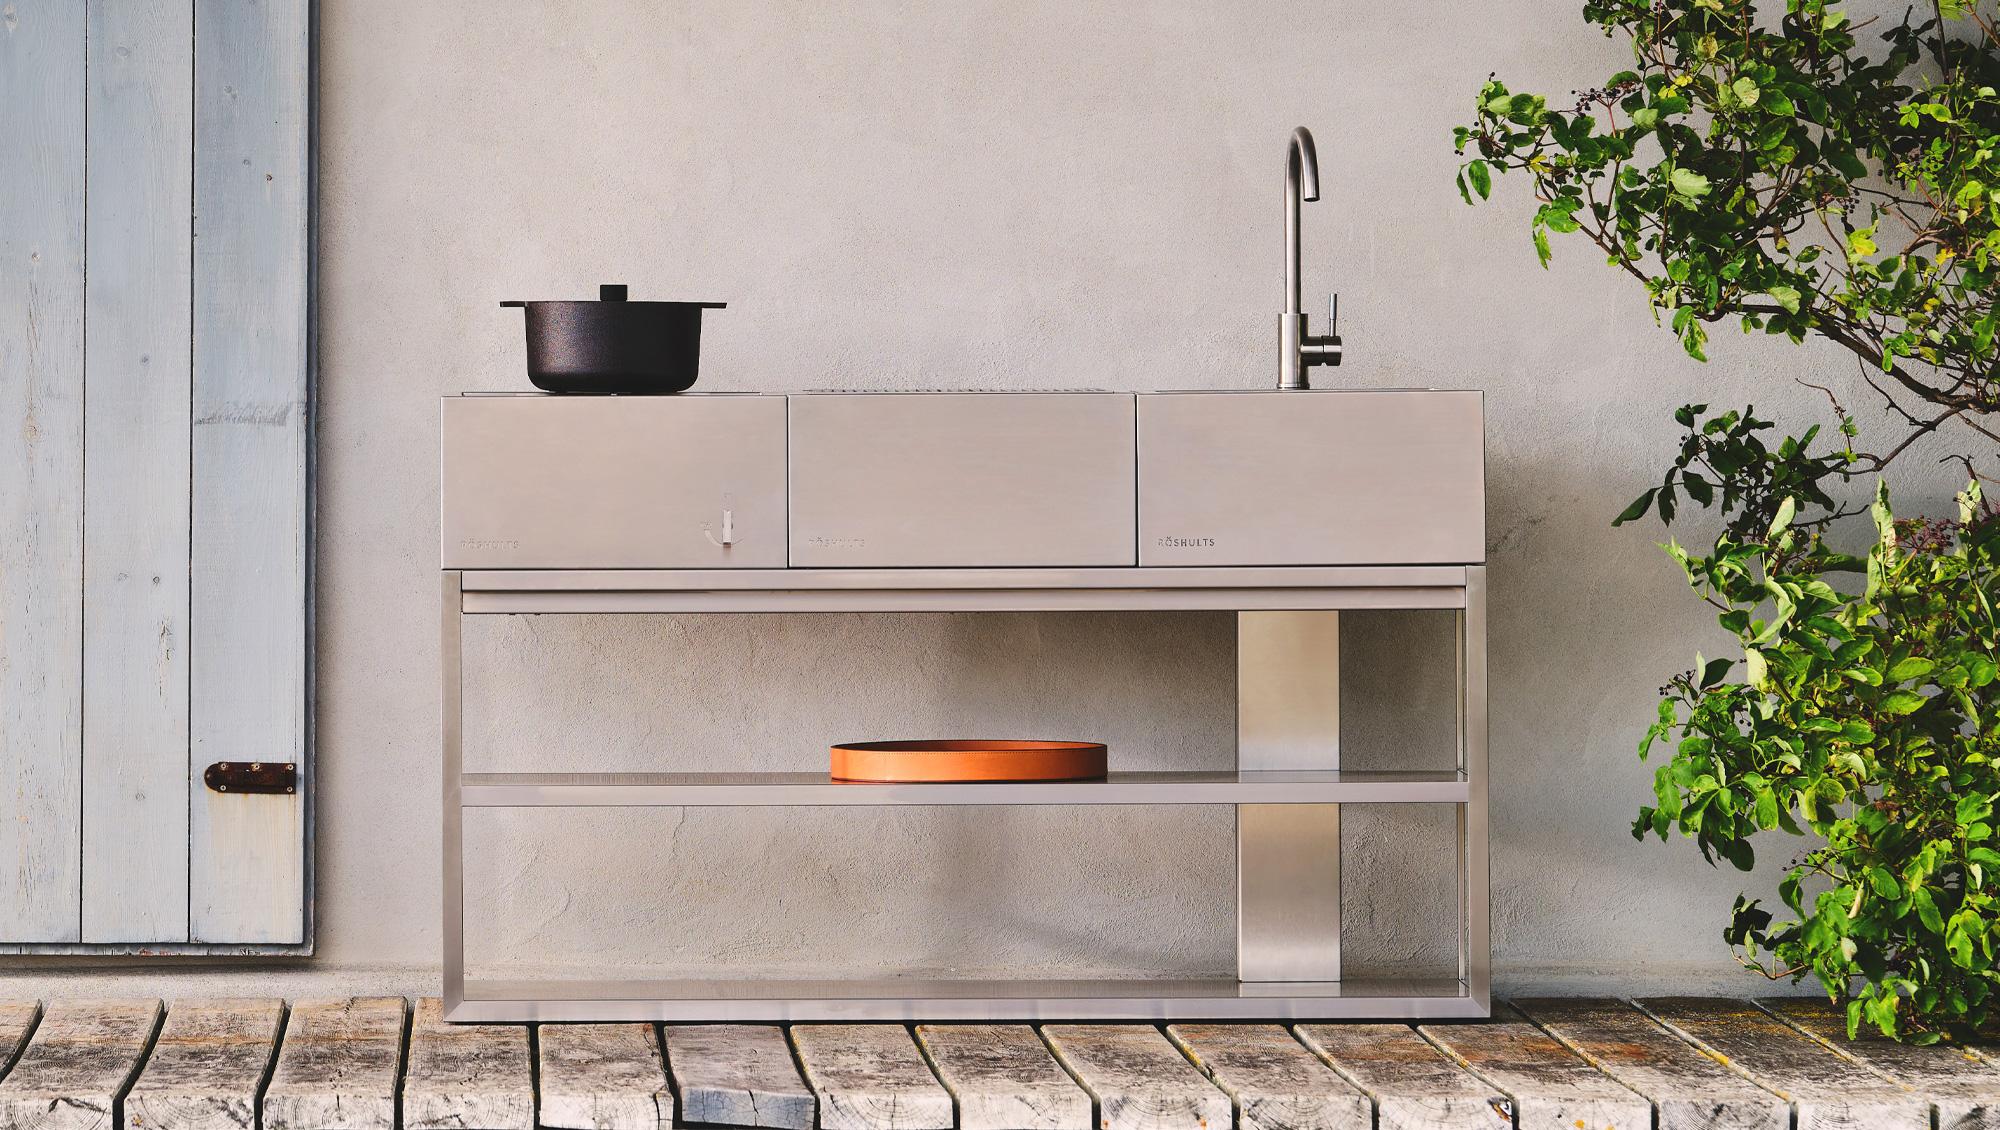 Image for Luv Interior GmbH